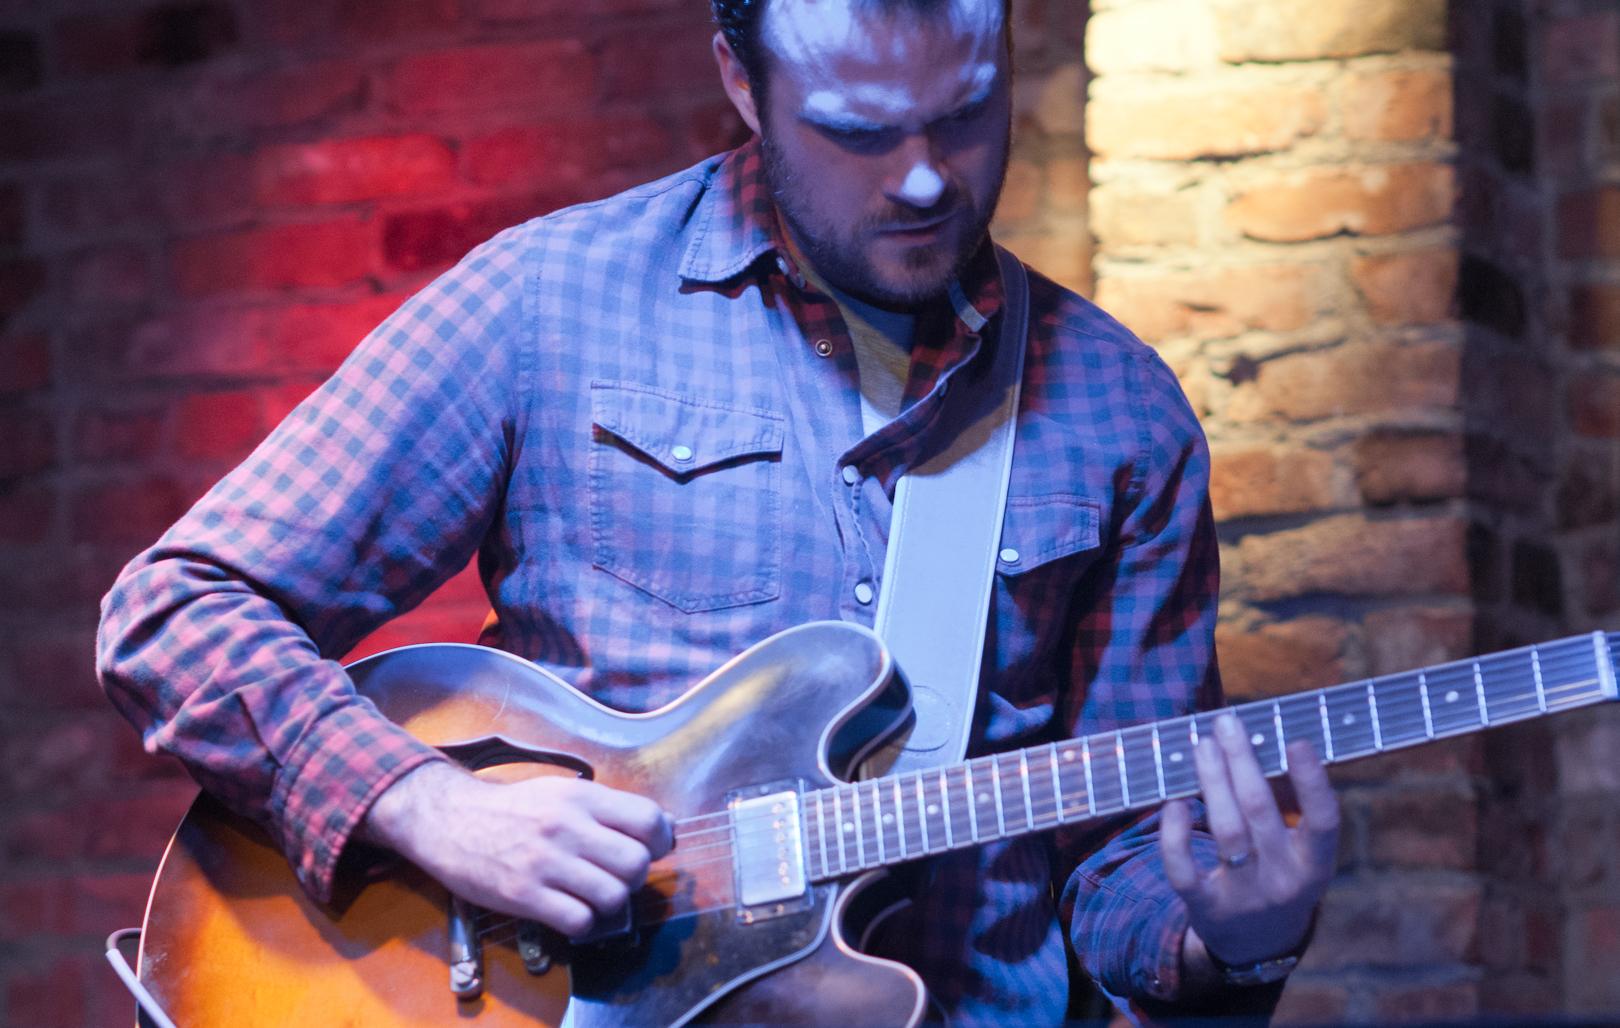 Matthew Stevens with Erimaj at the Winter Jazzfest 2012